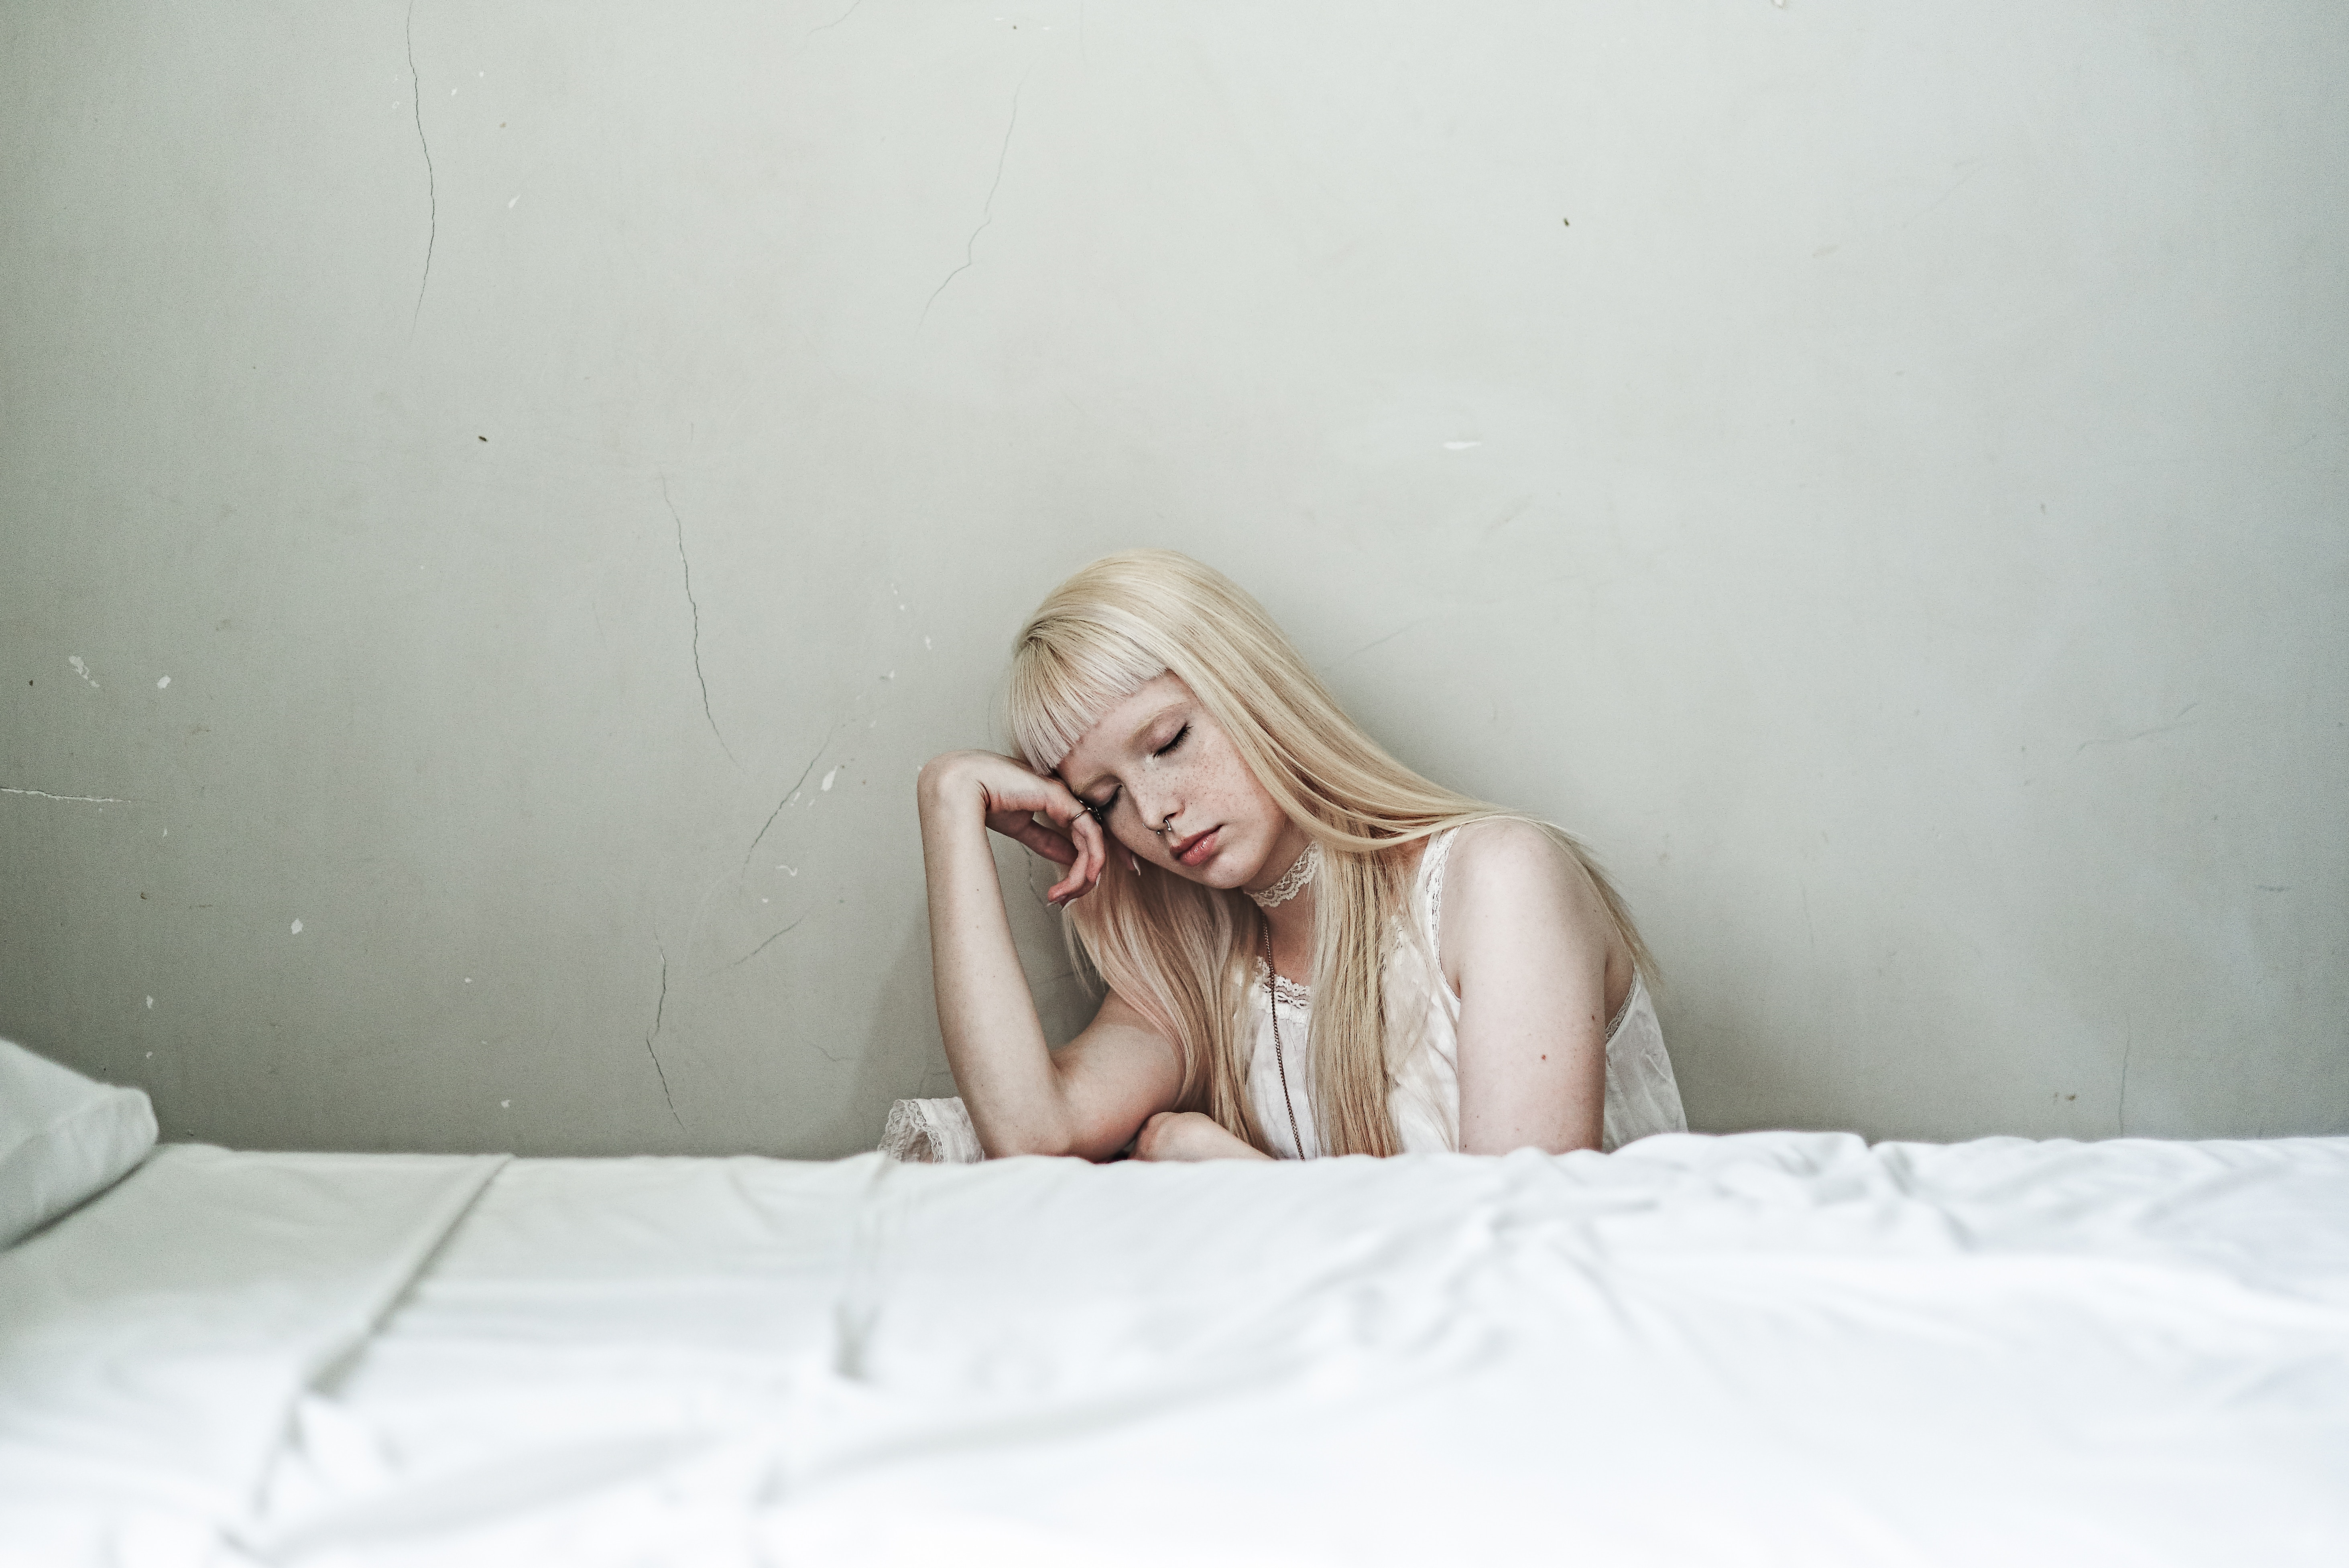 sad woman in white